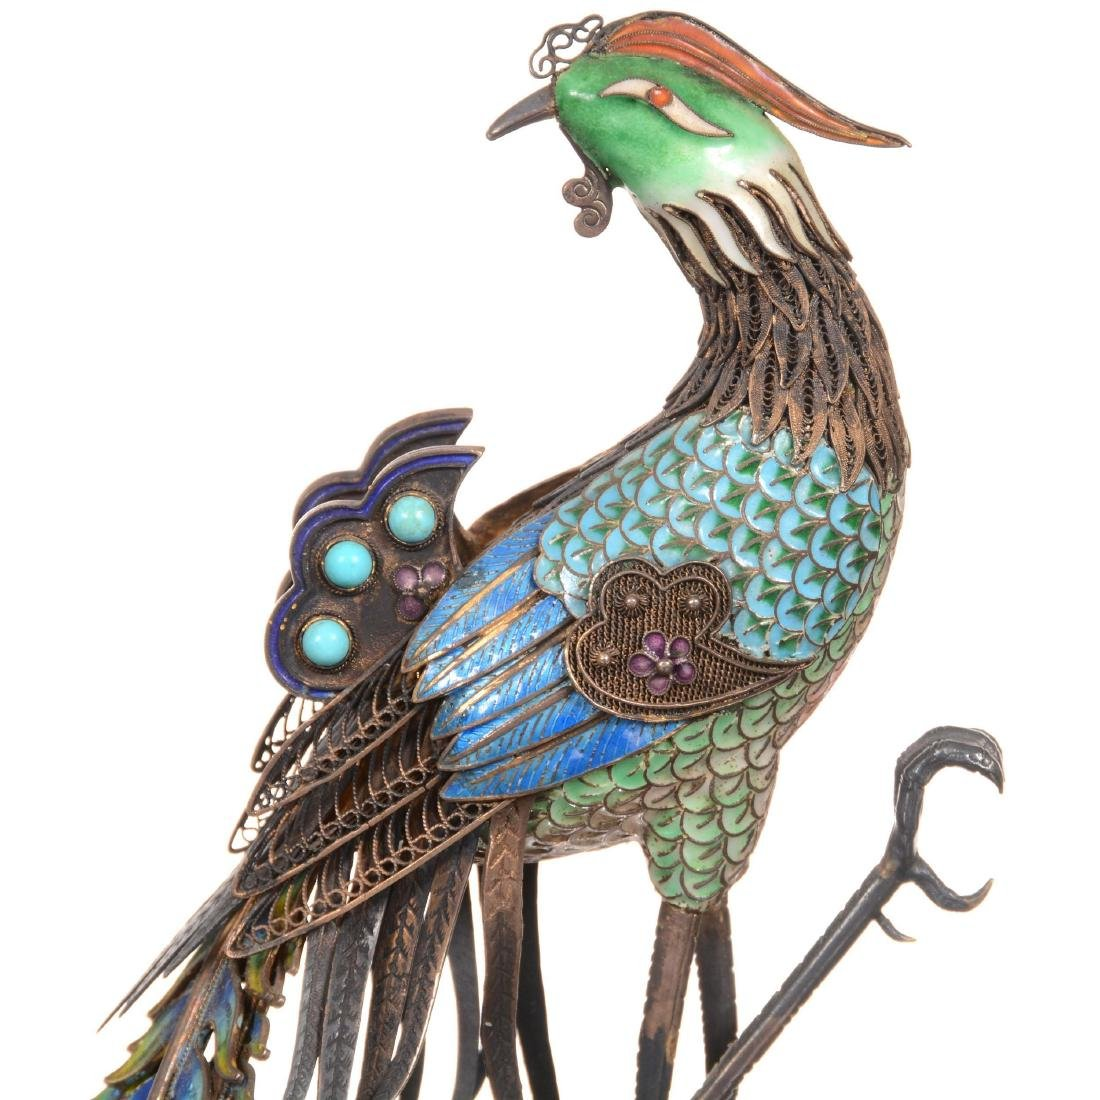 Chinese Silver & Enamel Figural Peacock on Teakwood Sta - 3